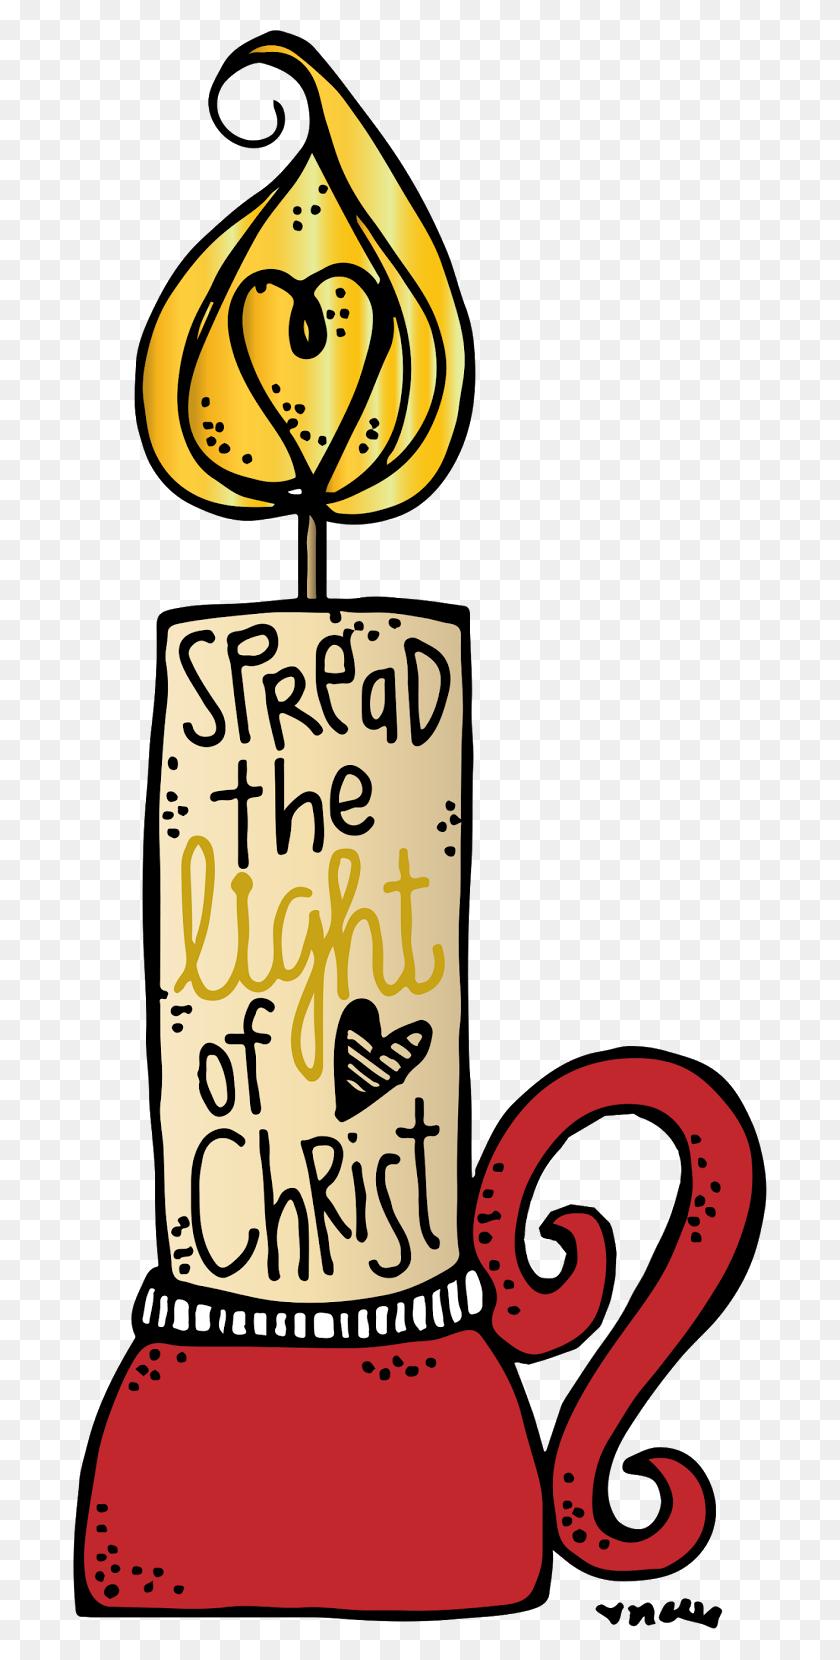 Melonheadz Lds Illustrating Bulletin Board Ideas - Church Bulletin Clip Art